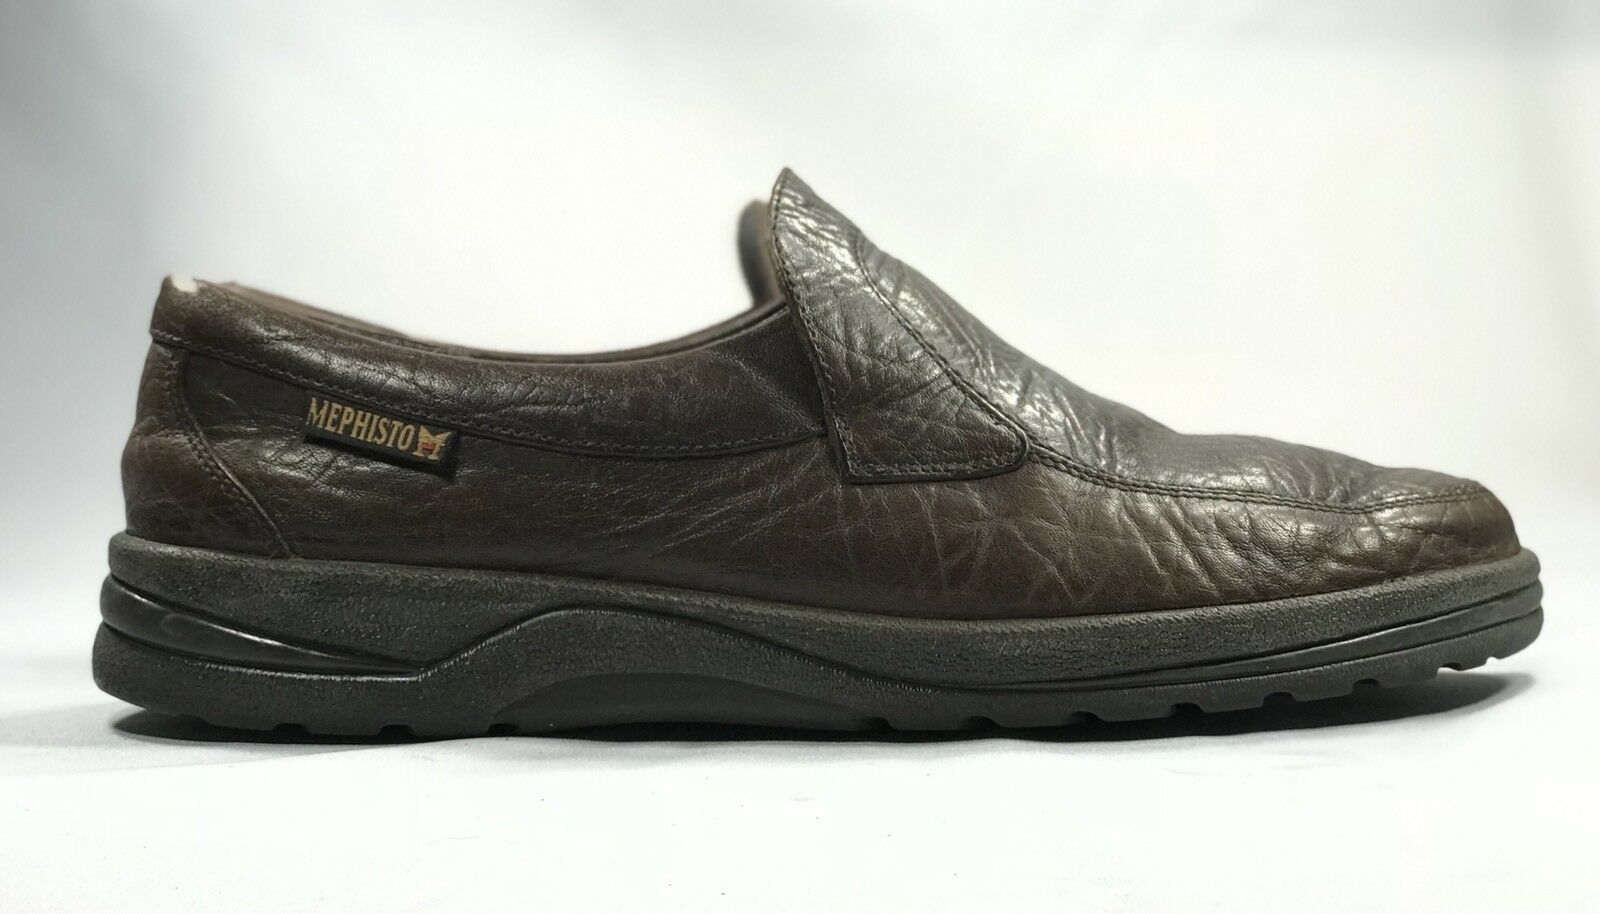 Scarpe casual da uomo  MESPHISTO AIR-JET 100% Caoutchouc Textured Leather uomo Slip On Loafers US 10